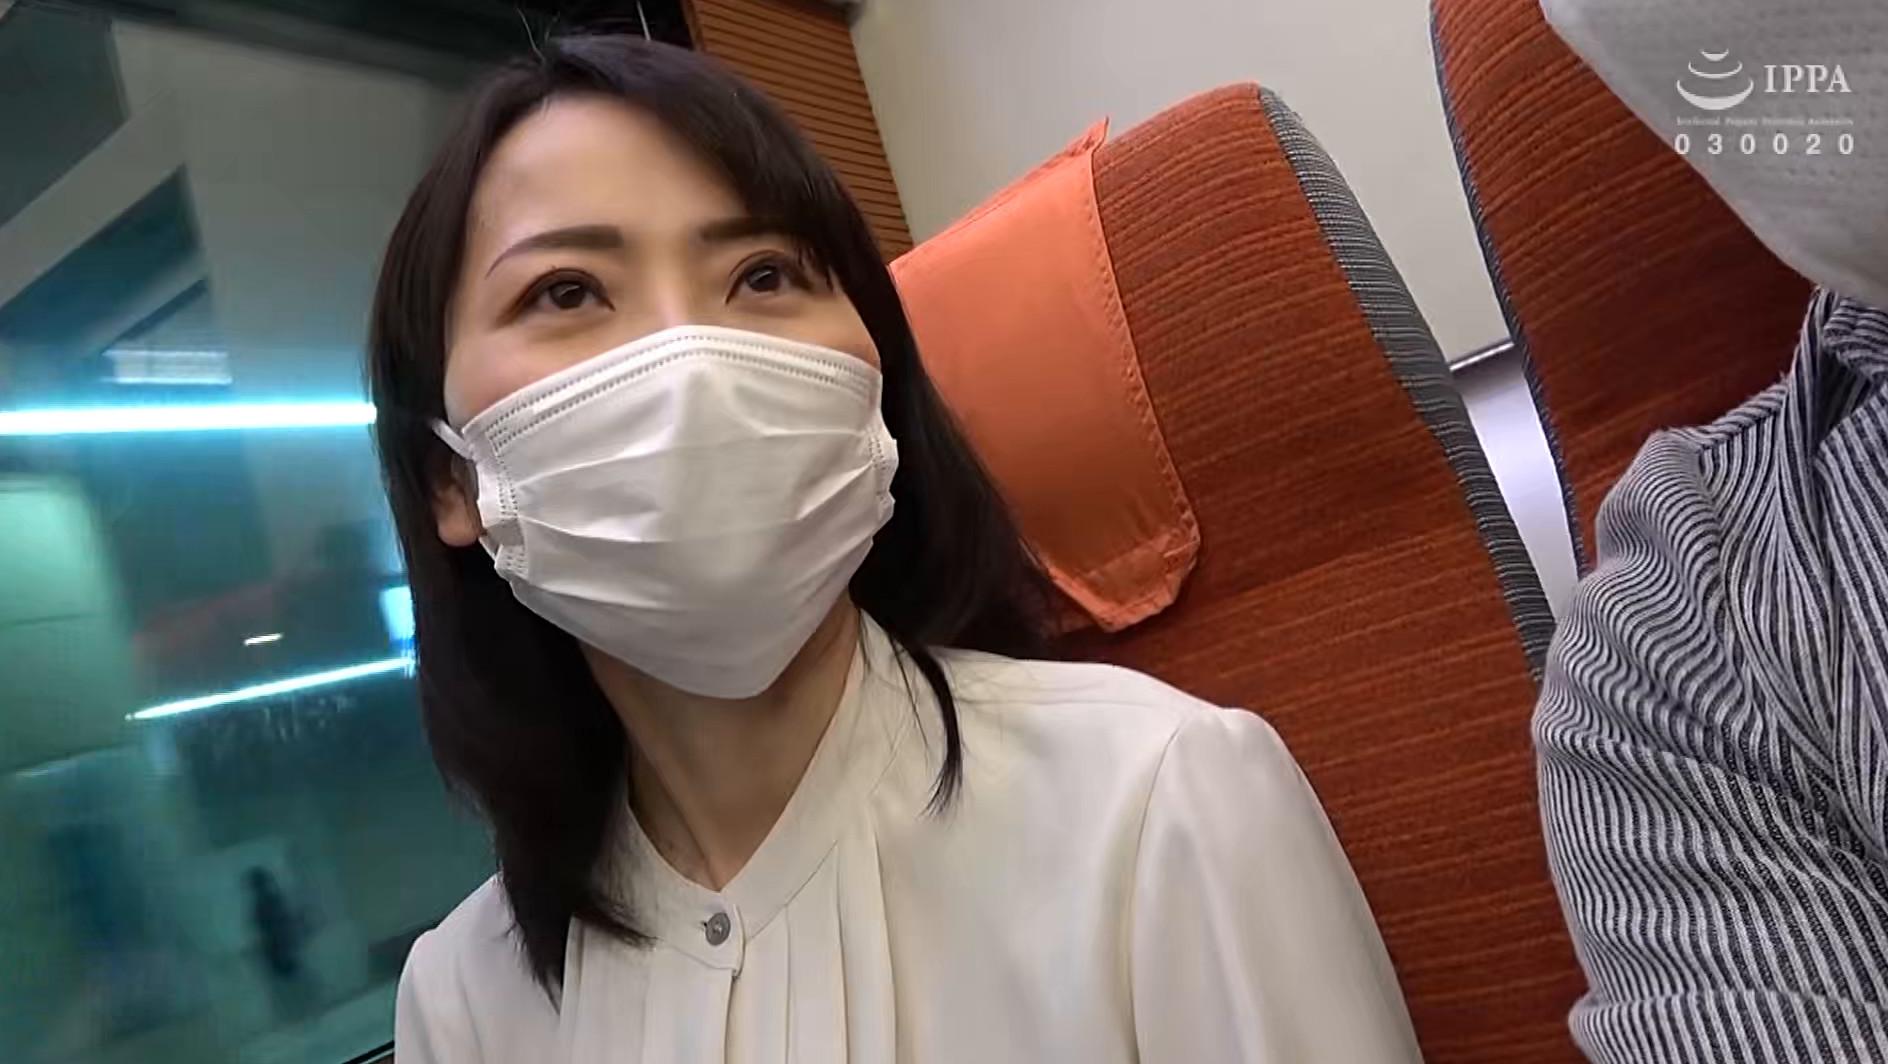 日帰り温泉 熟女色情旅 #026 紗月(仮) 48歳 離婚1回 子供無し